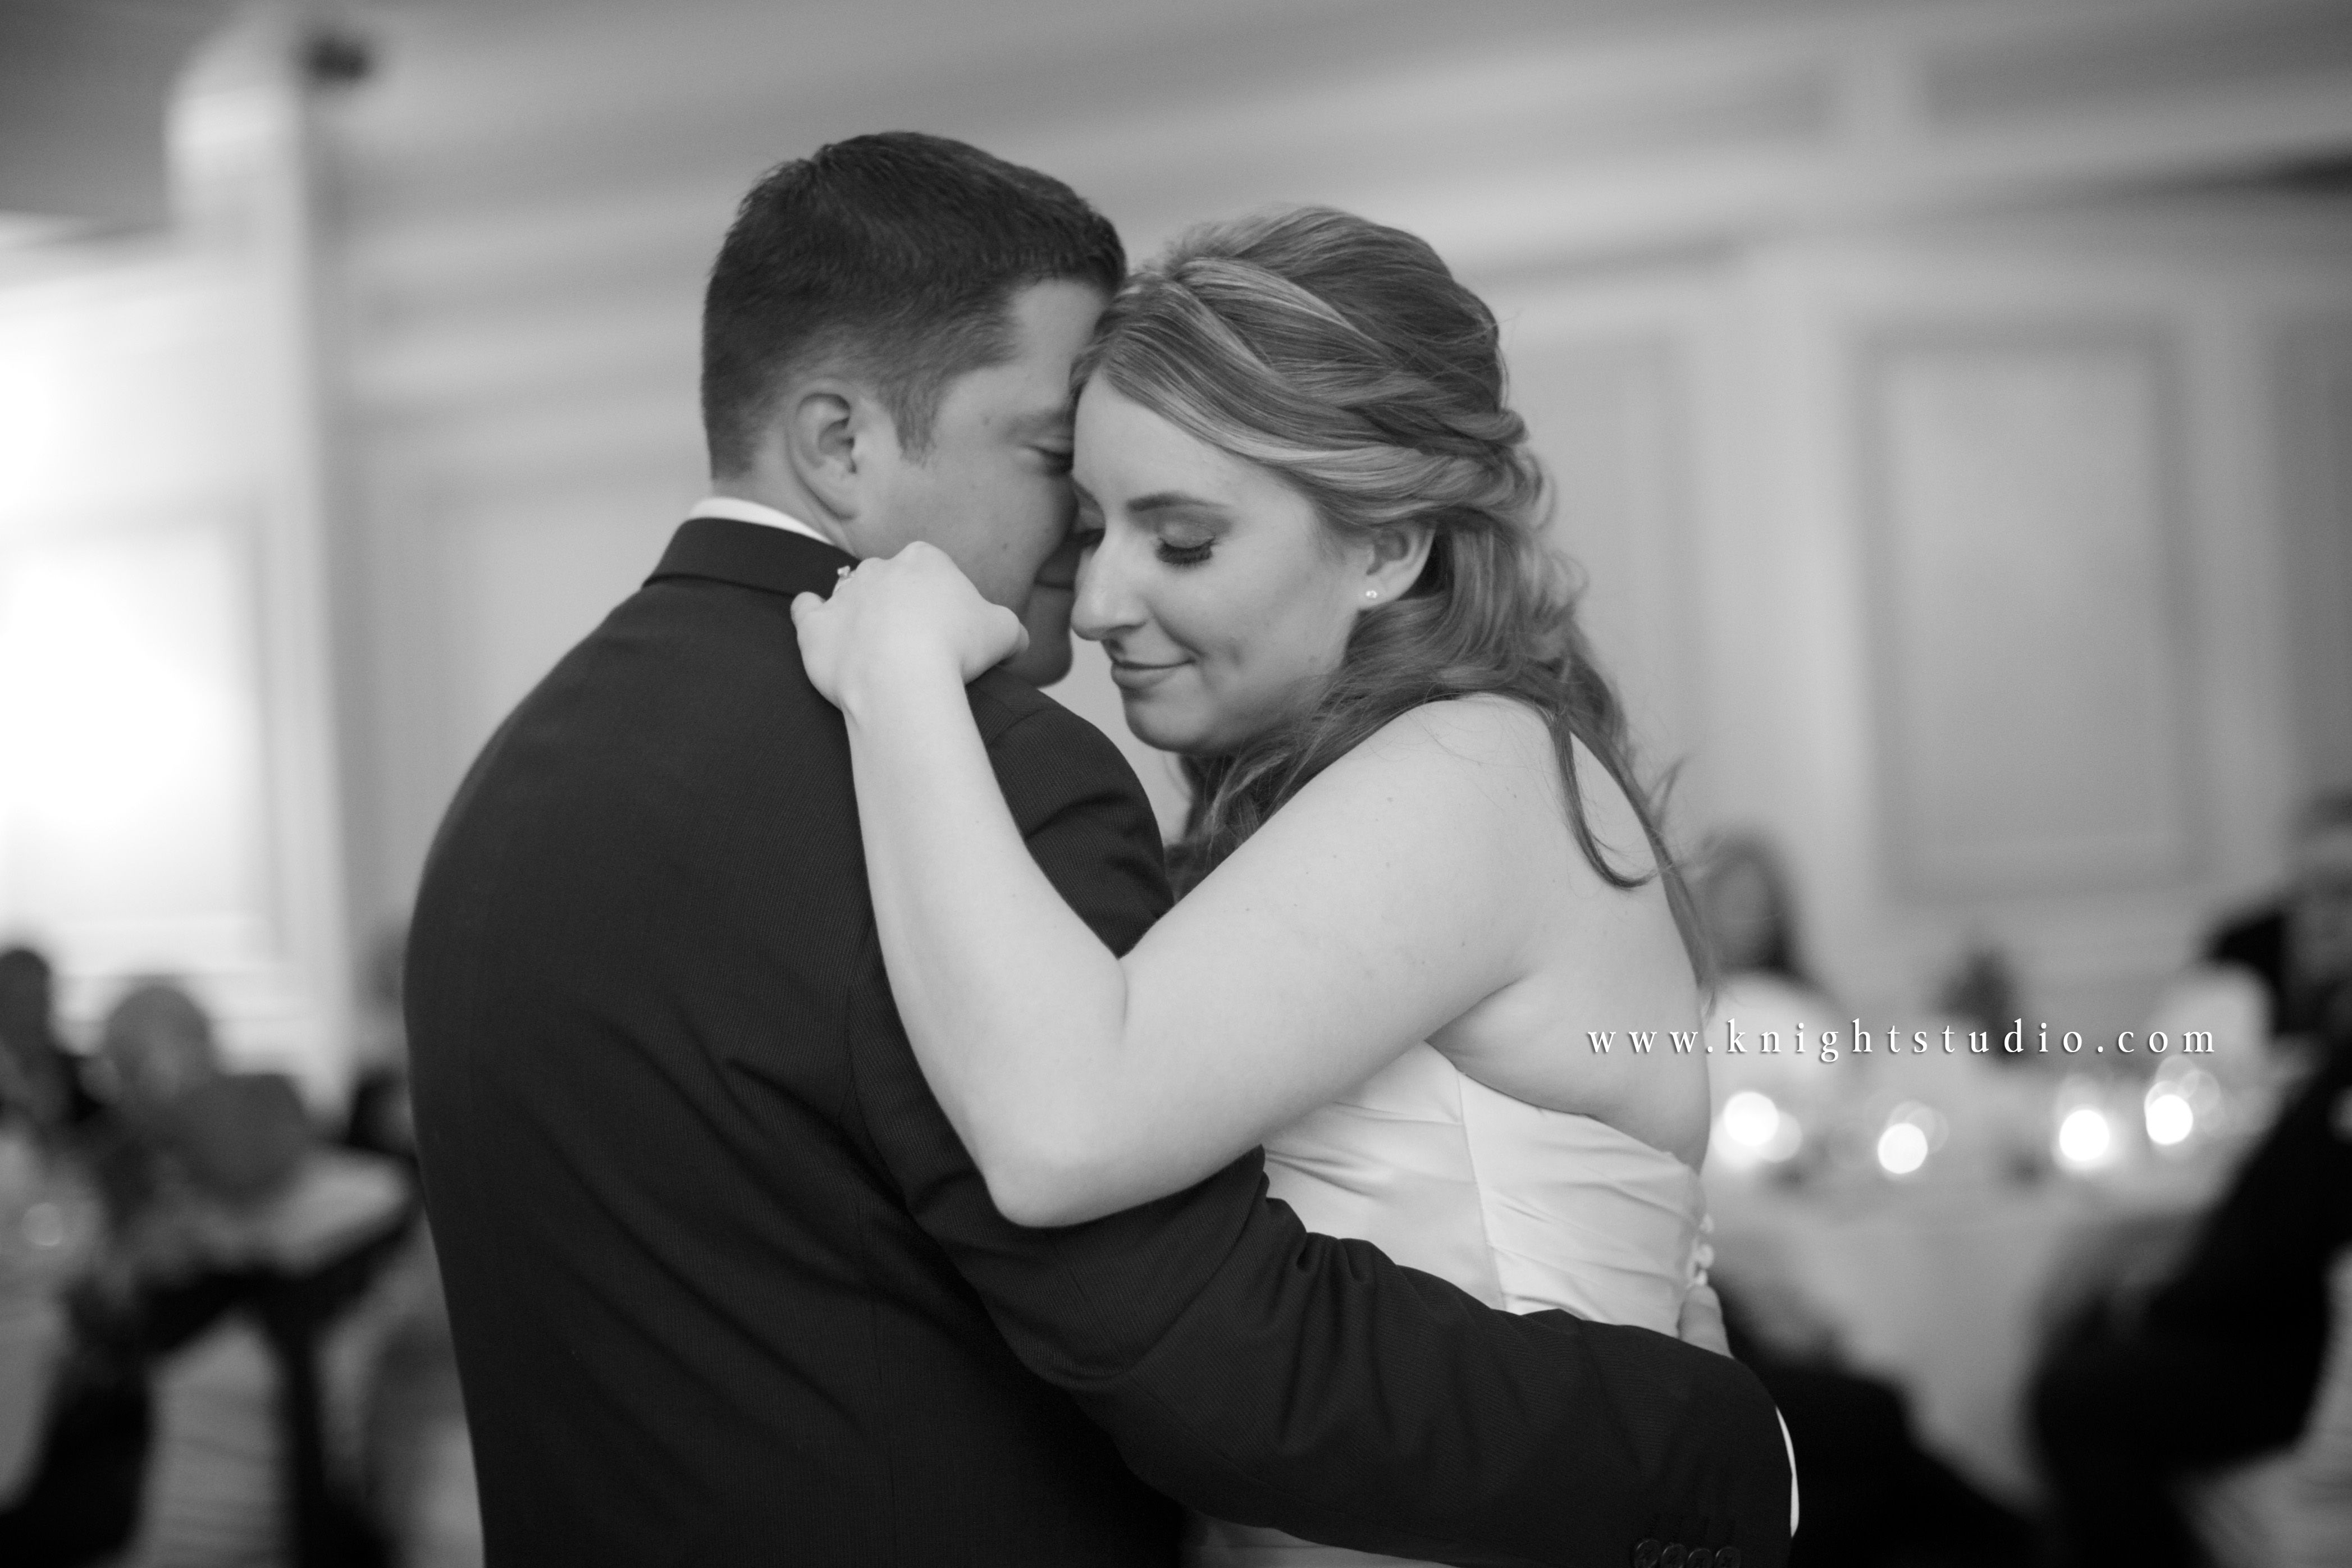 Buffalo NY Wedding Photography | www.knightstudio.com | Photographer: Robert Knight | The First Dance #knightstudio #buffalobride #weddingphotography #wedding #bride #groom #buffalo #wny #firstdance #dancing #couple #dress #romantic